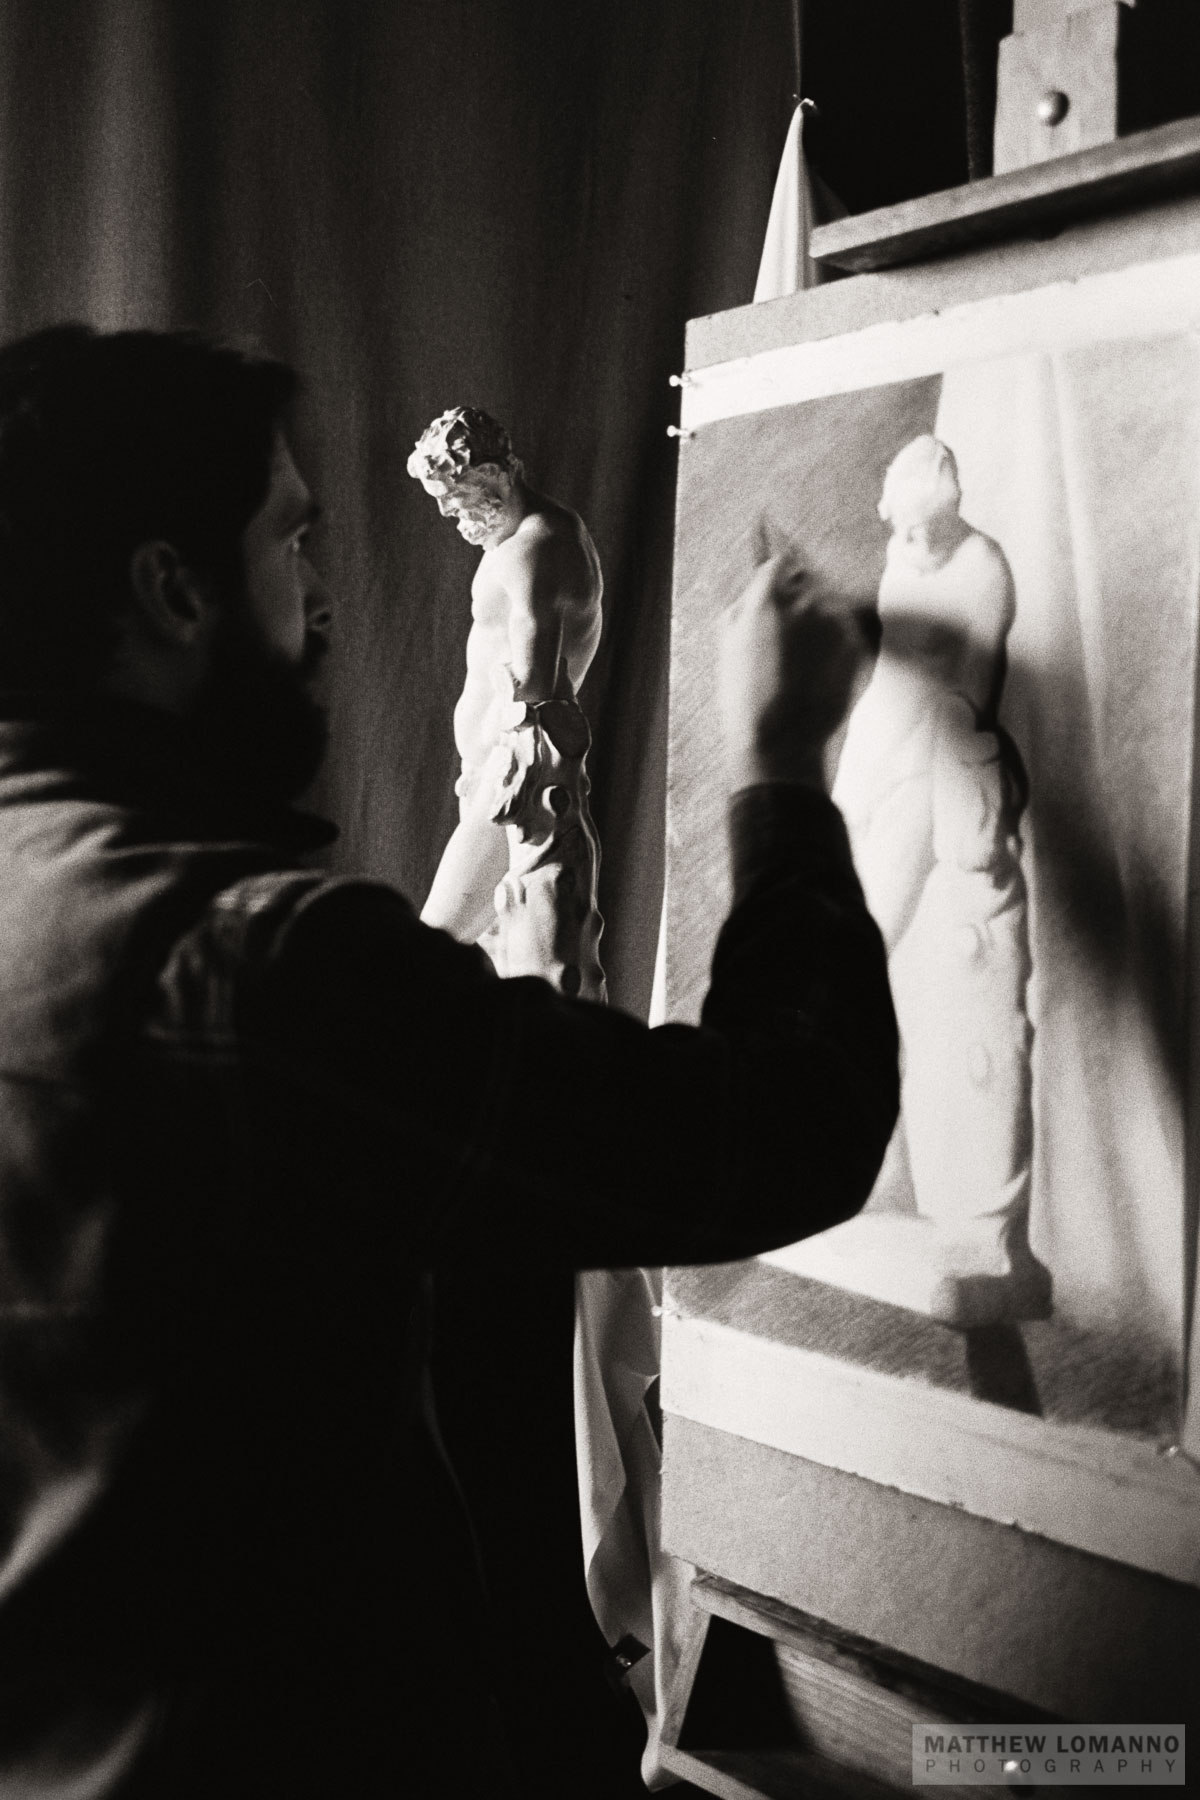 Ingbretson_atelier_working_by_Lomanno-15.jpg